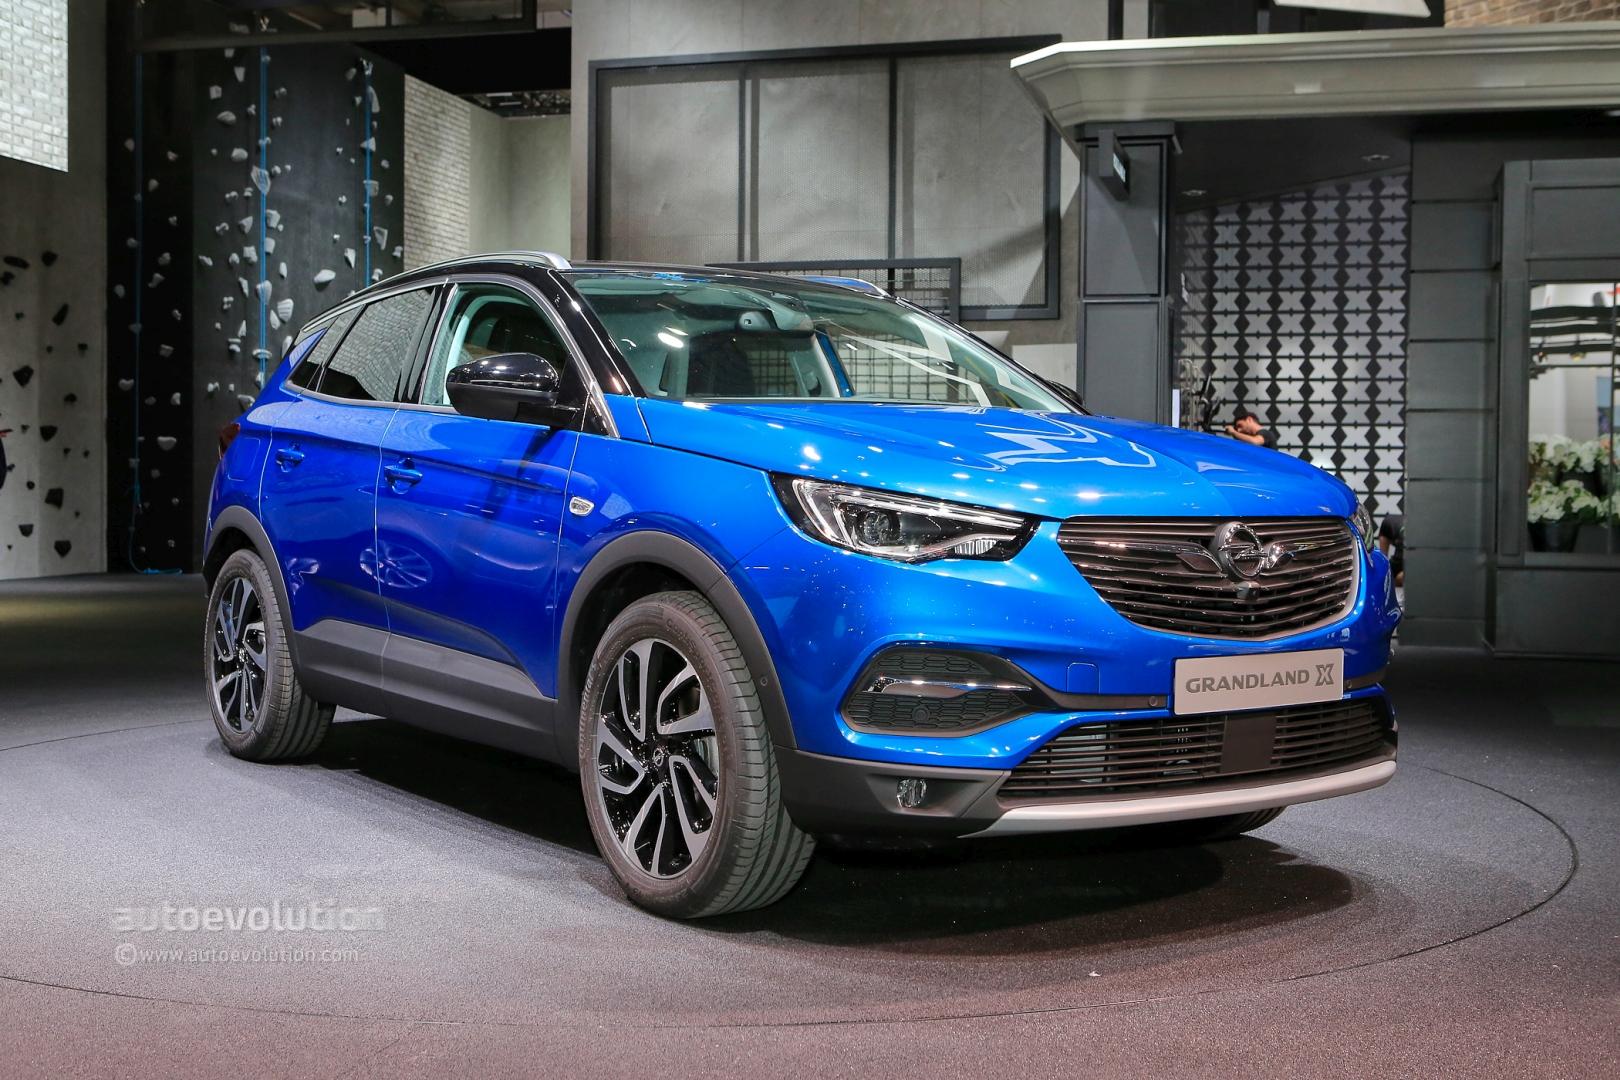 Opel Grandland X, Insignia GSi and Country Tourer Bow in Frankfurt - autoevolution